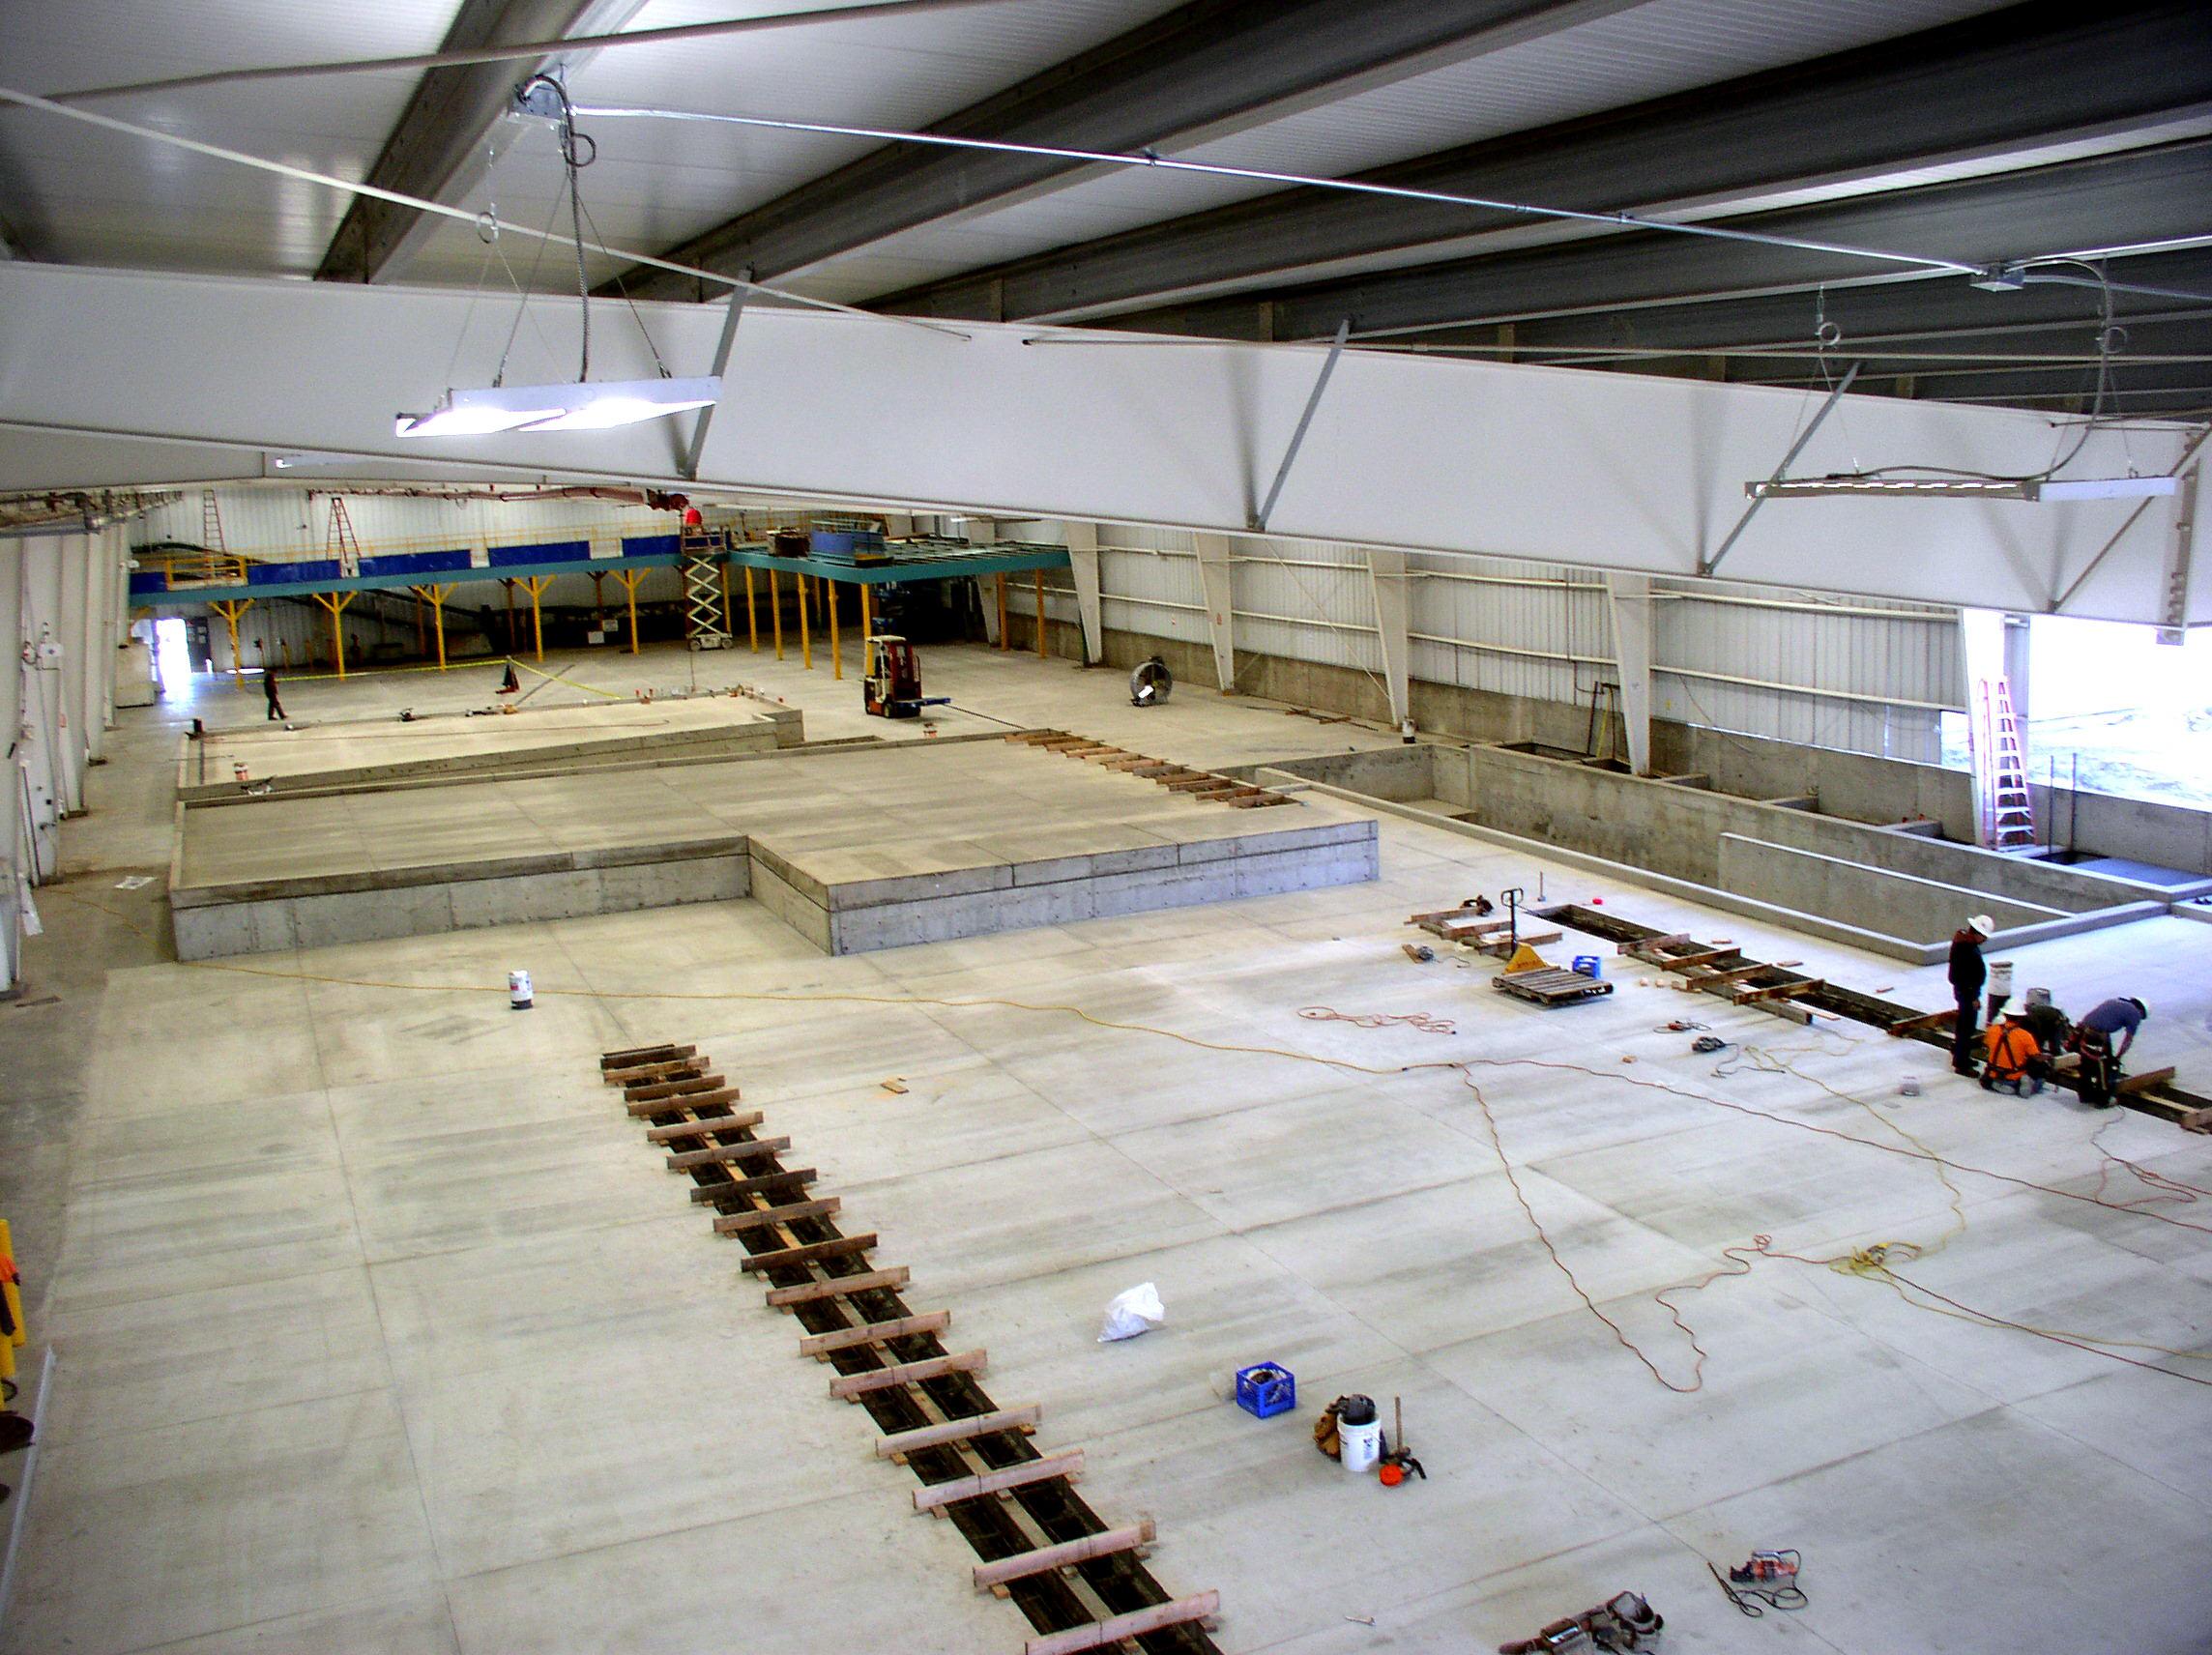 Morada Produce Agriculture Farm Construction General Contractor Steel Metal building Crop Storage Warehouse